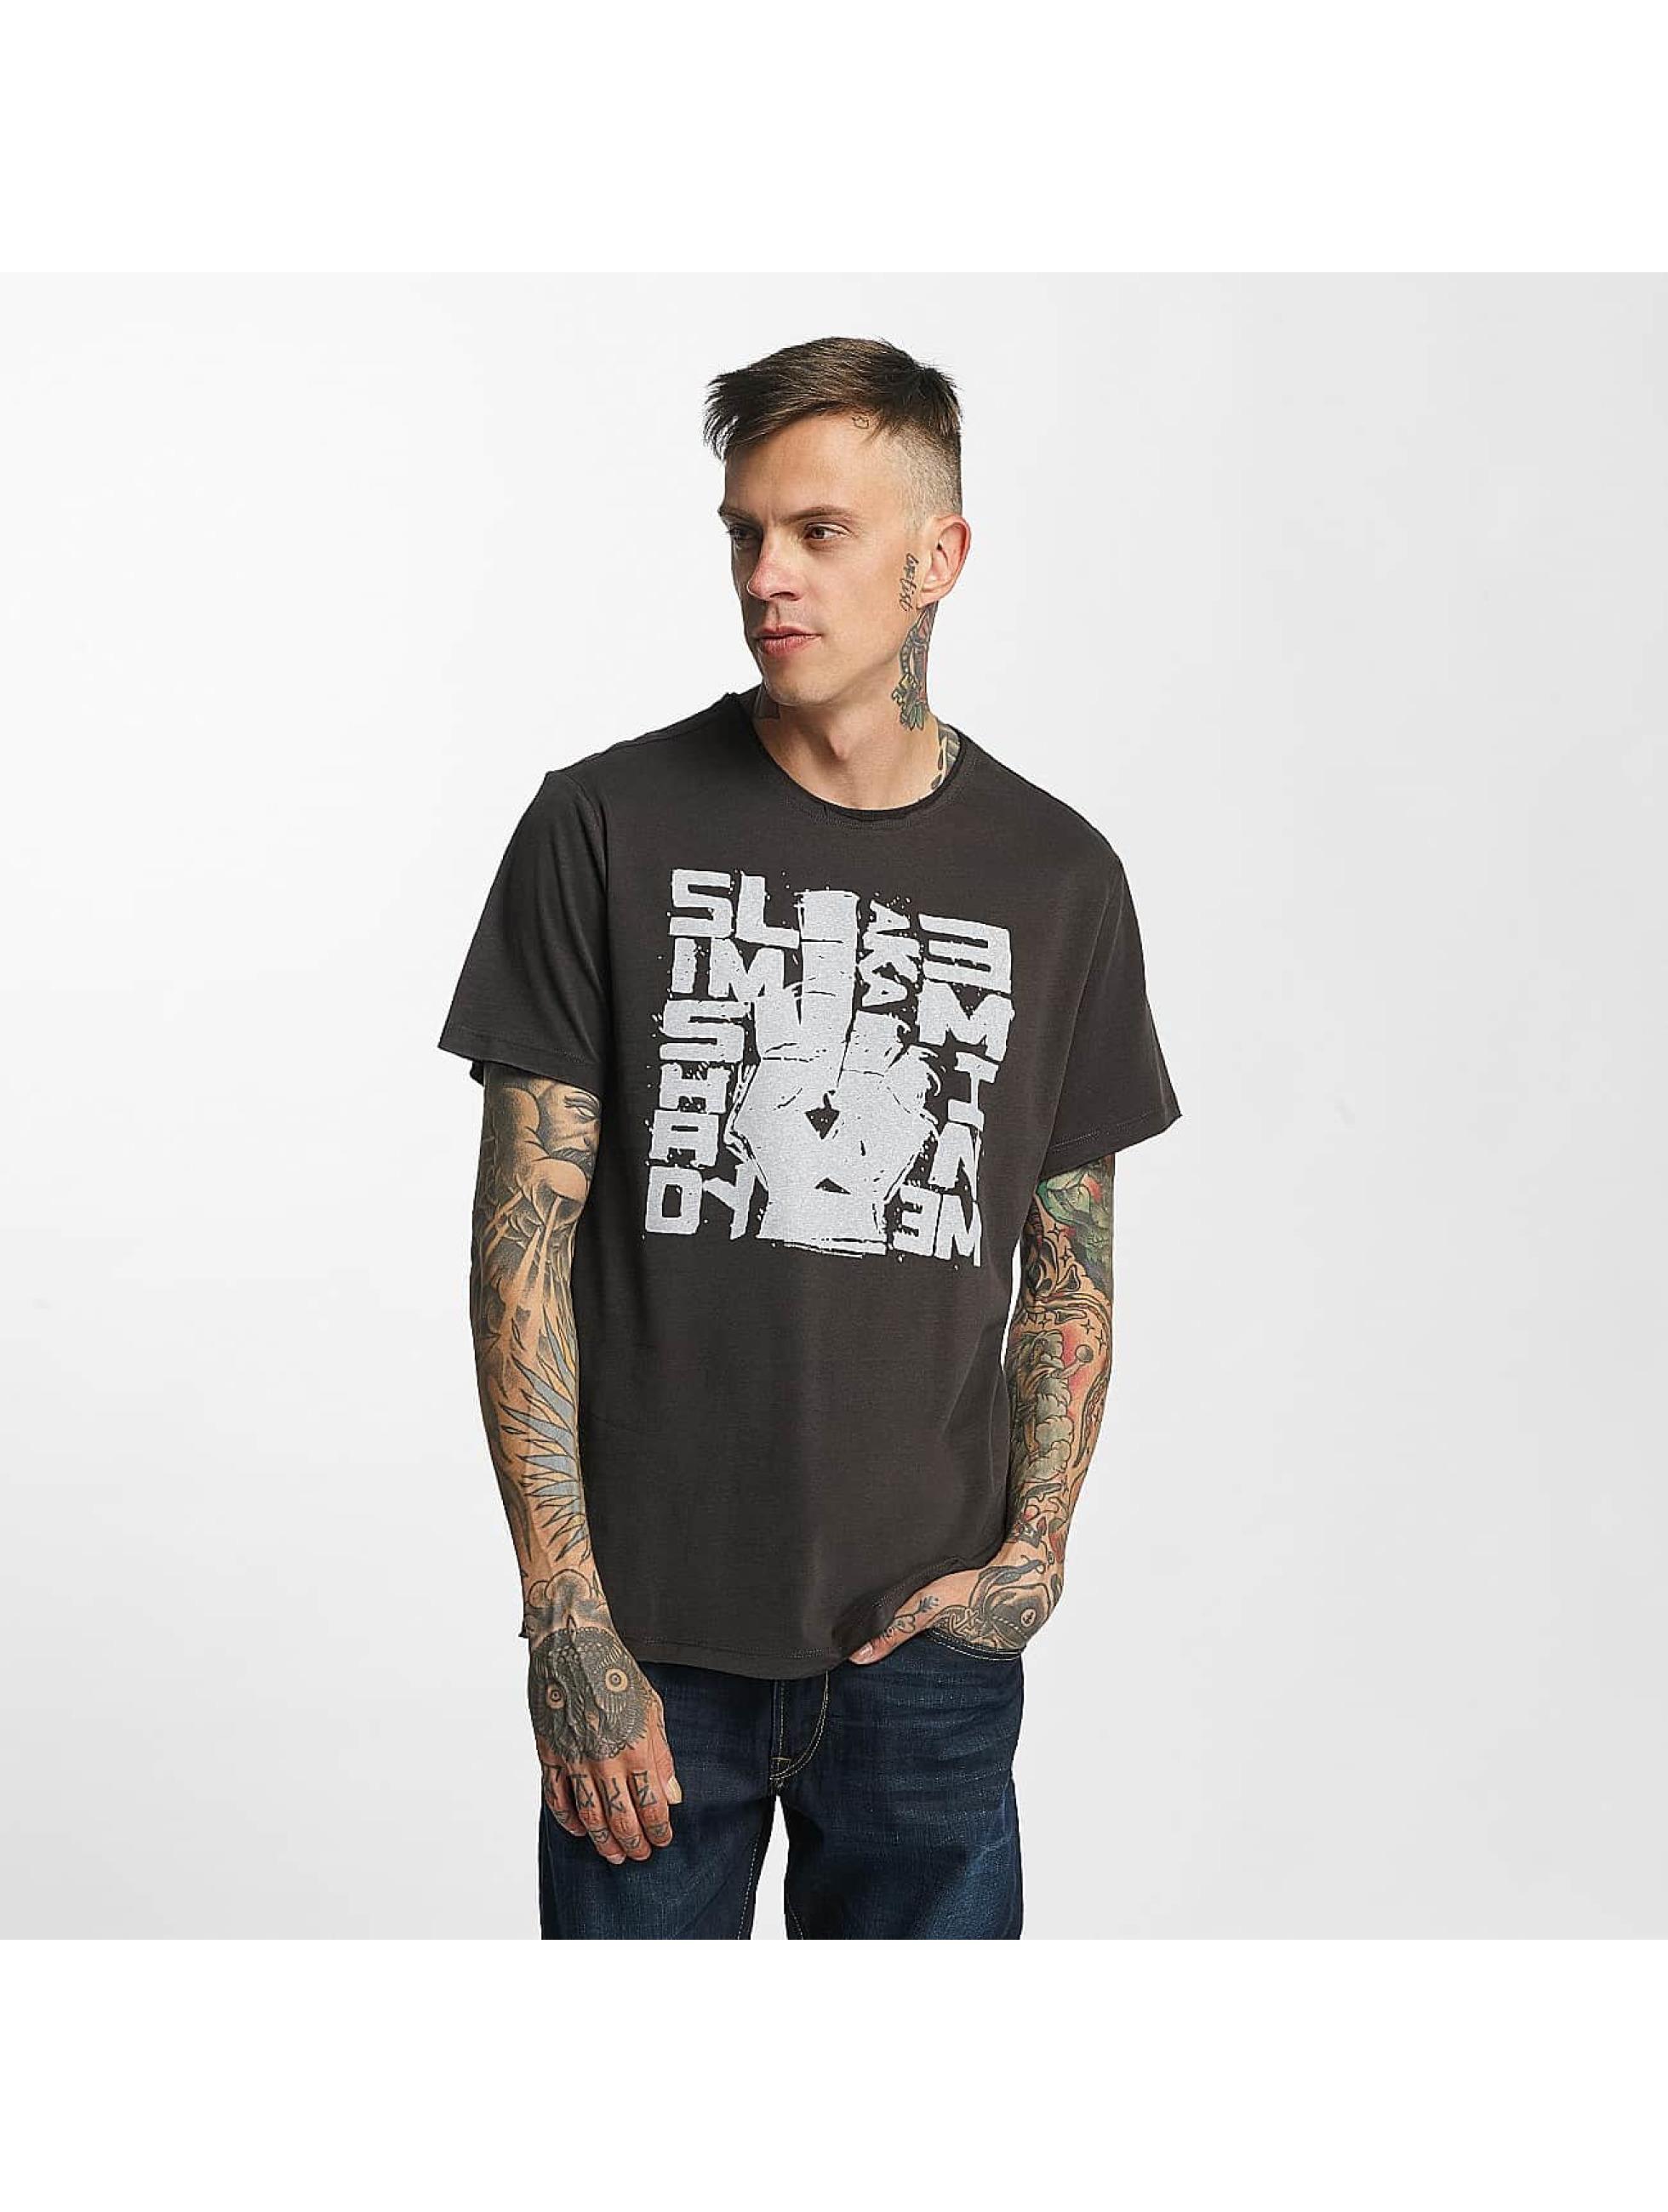 Amplified T-Shirt Eminem Slim Shady grey